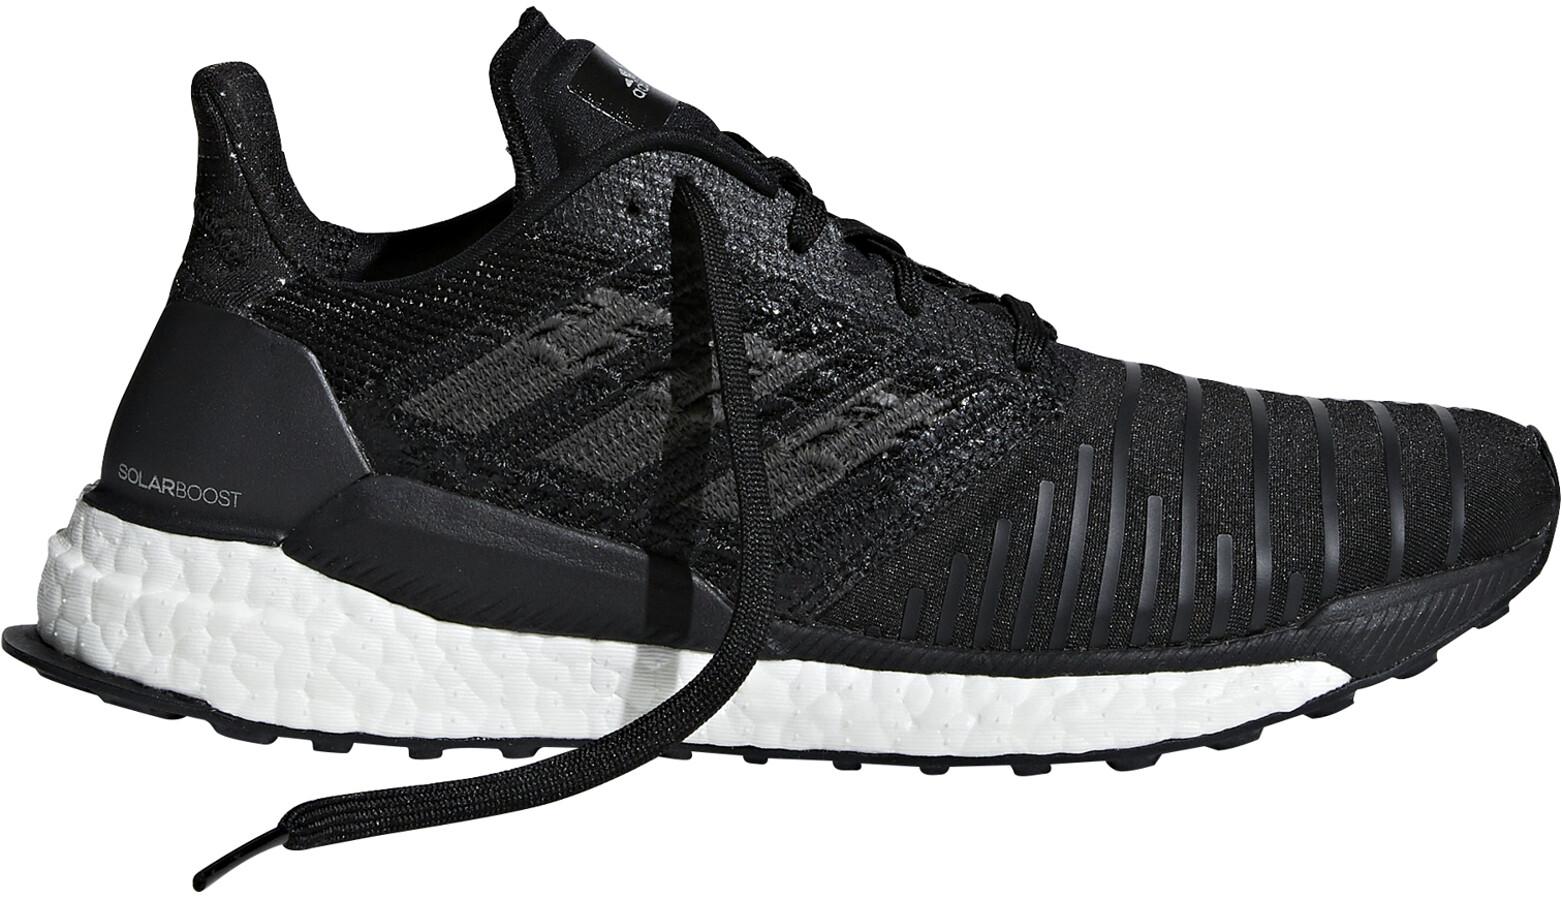 on sale 331fd 96220 adidas Solar Boost - Zapatillas running Mujer - negro